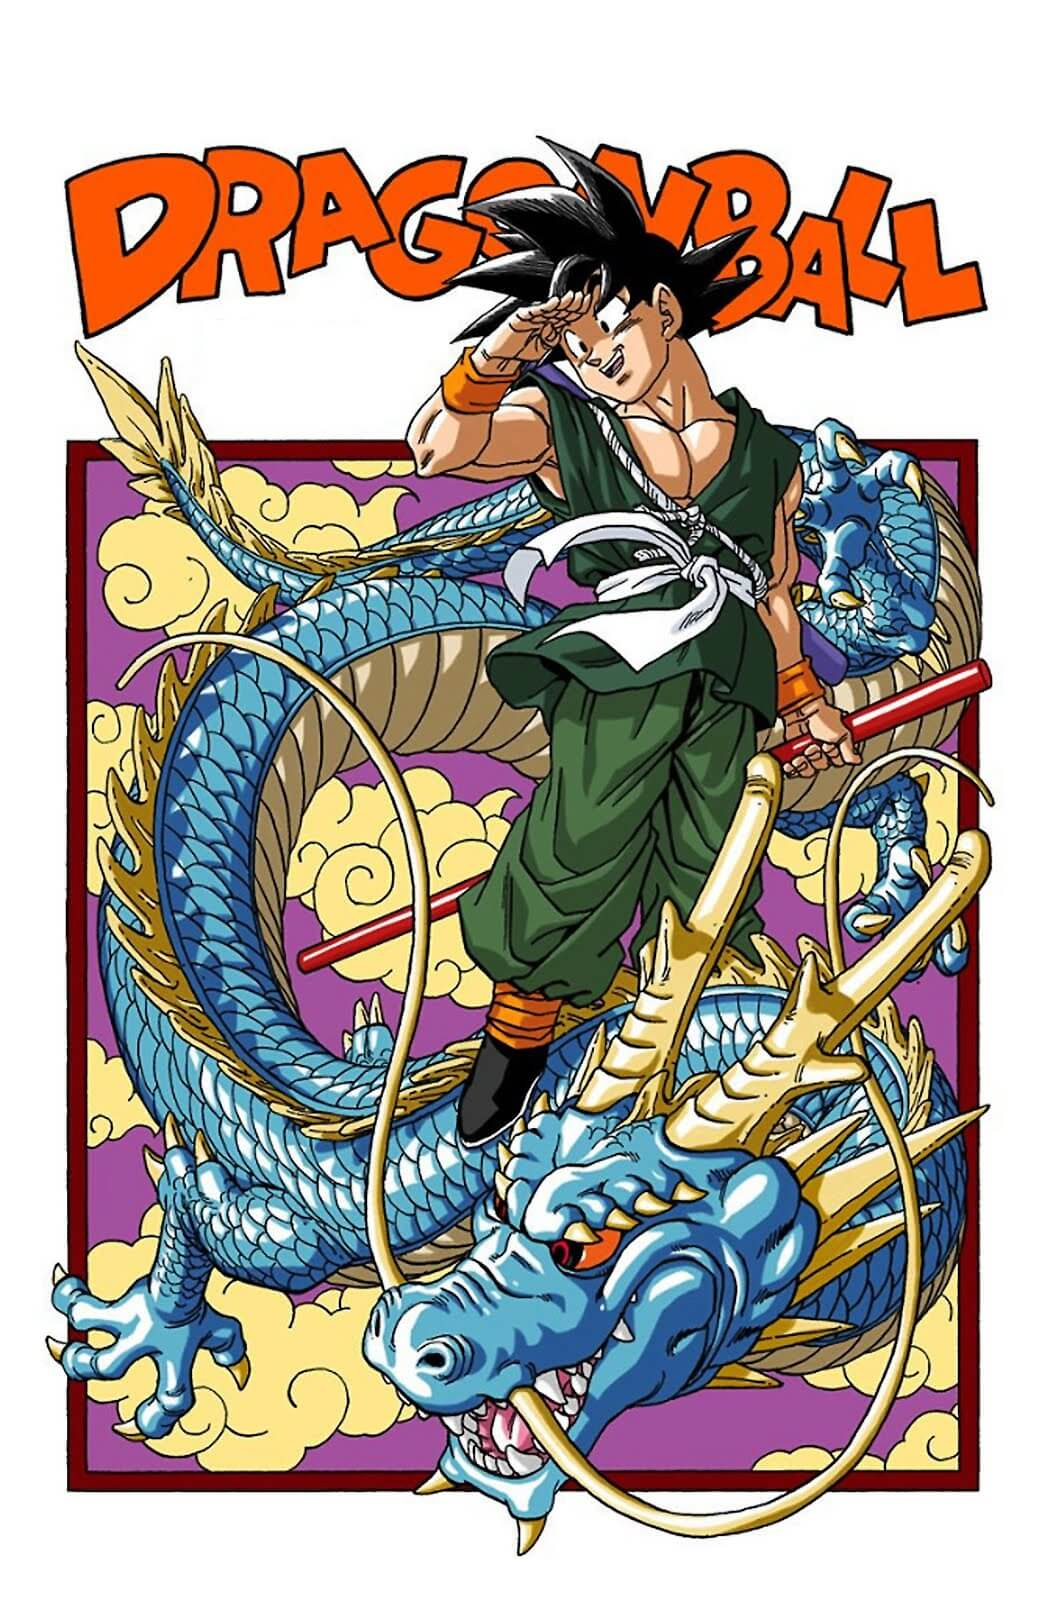 Descargar manga de Dragonball a Color en PDF por Mega y Mediafire manga completo en español a color